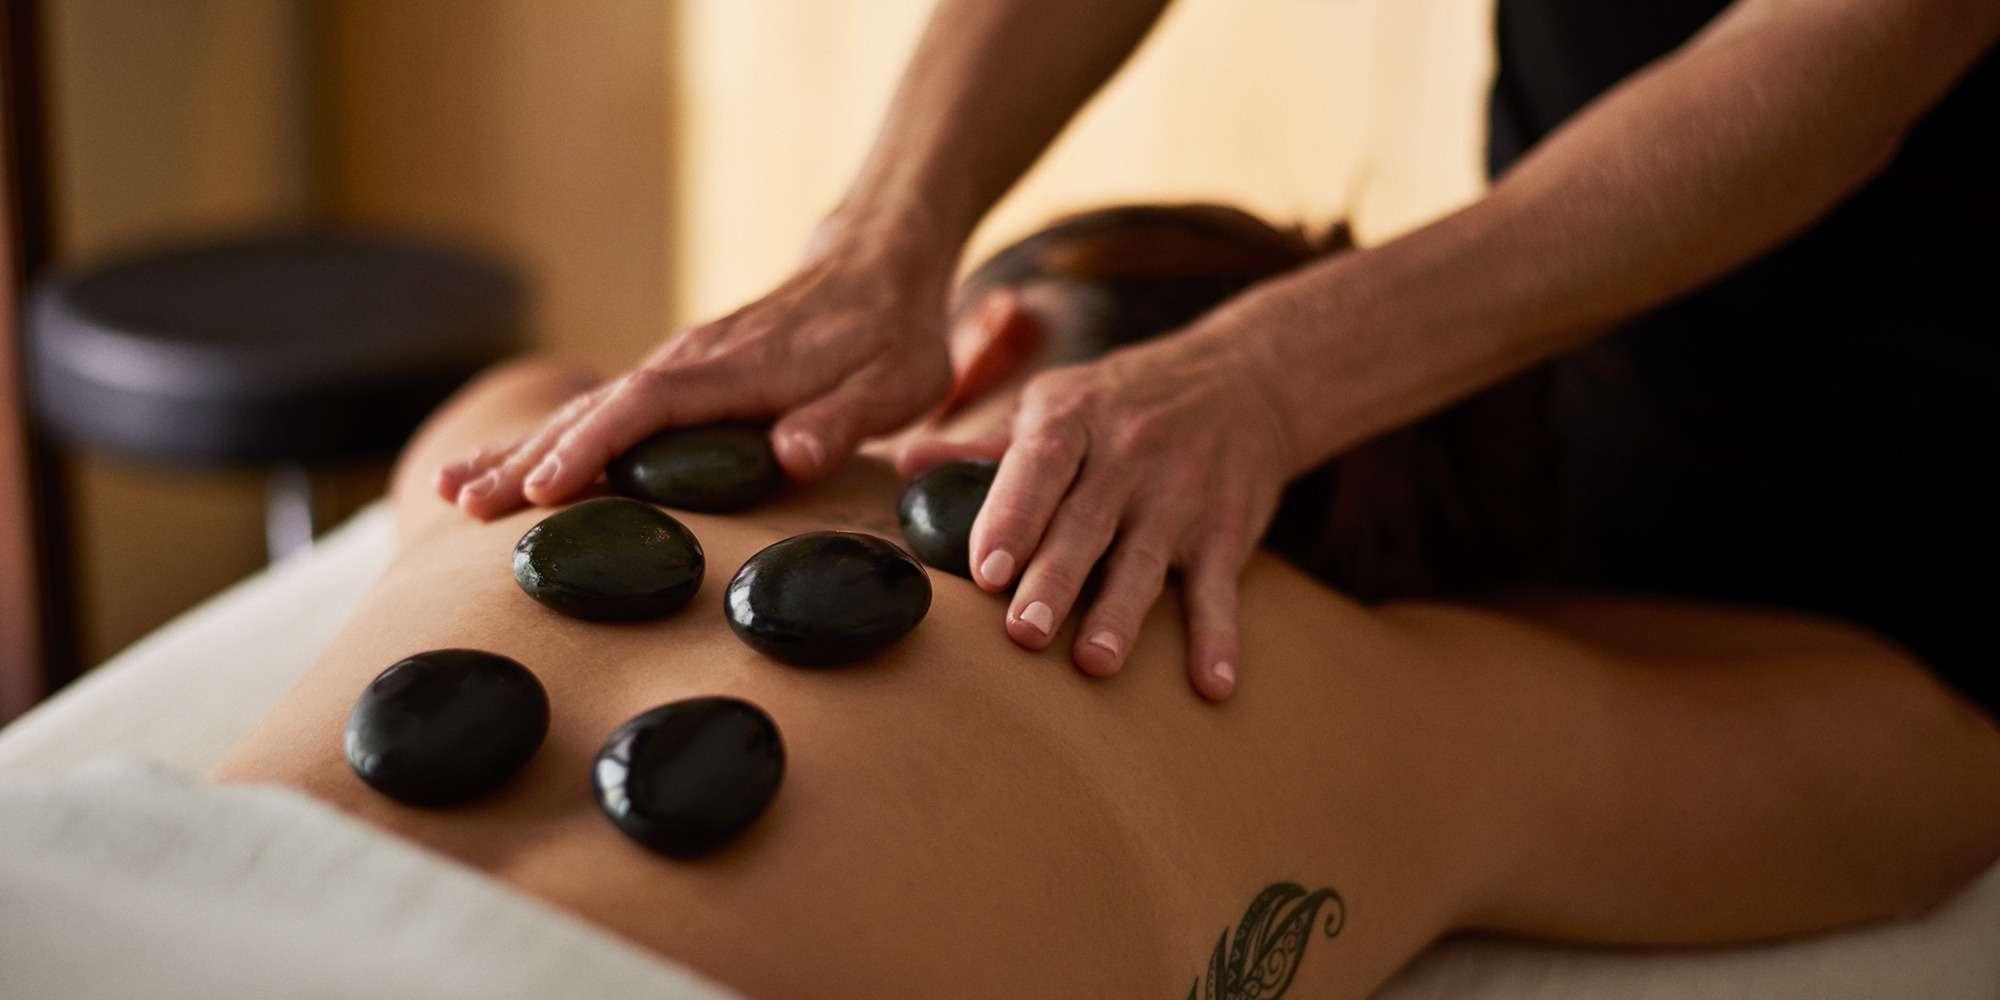 massage cơ thể